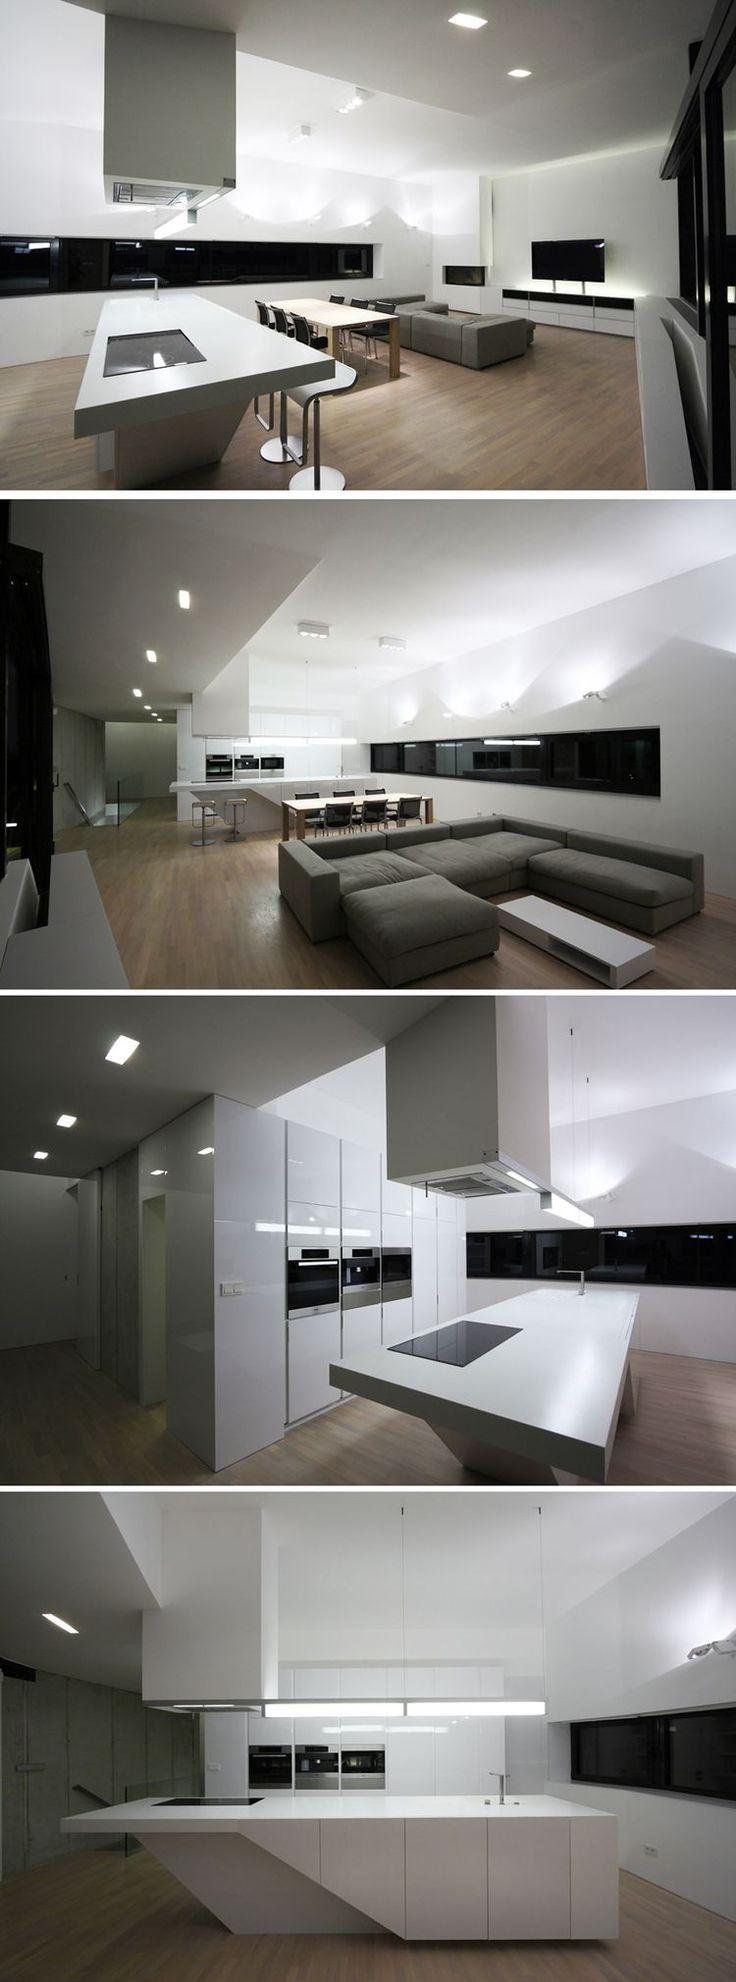 22 best bulthaup kitchens white images on pinterest kitchen